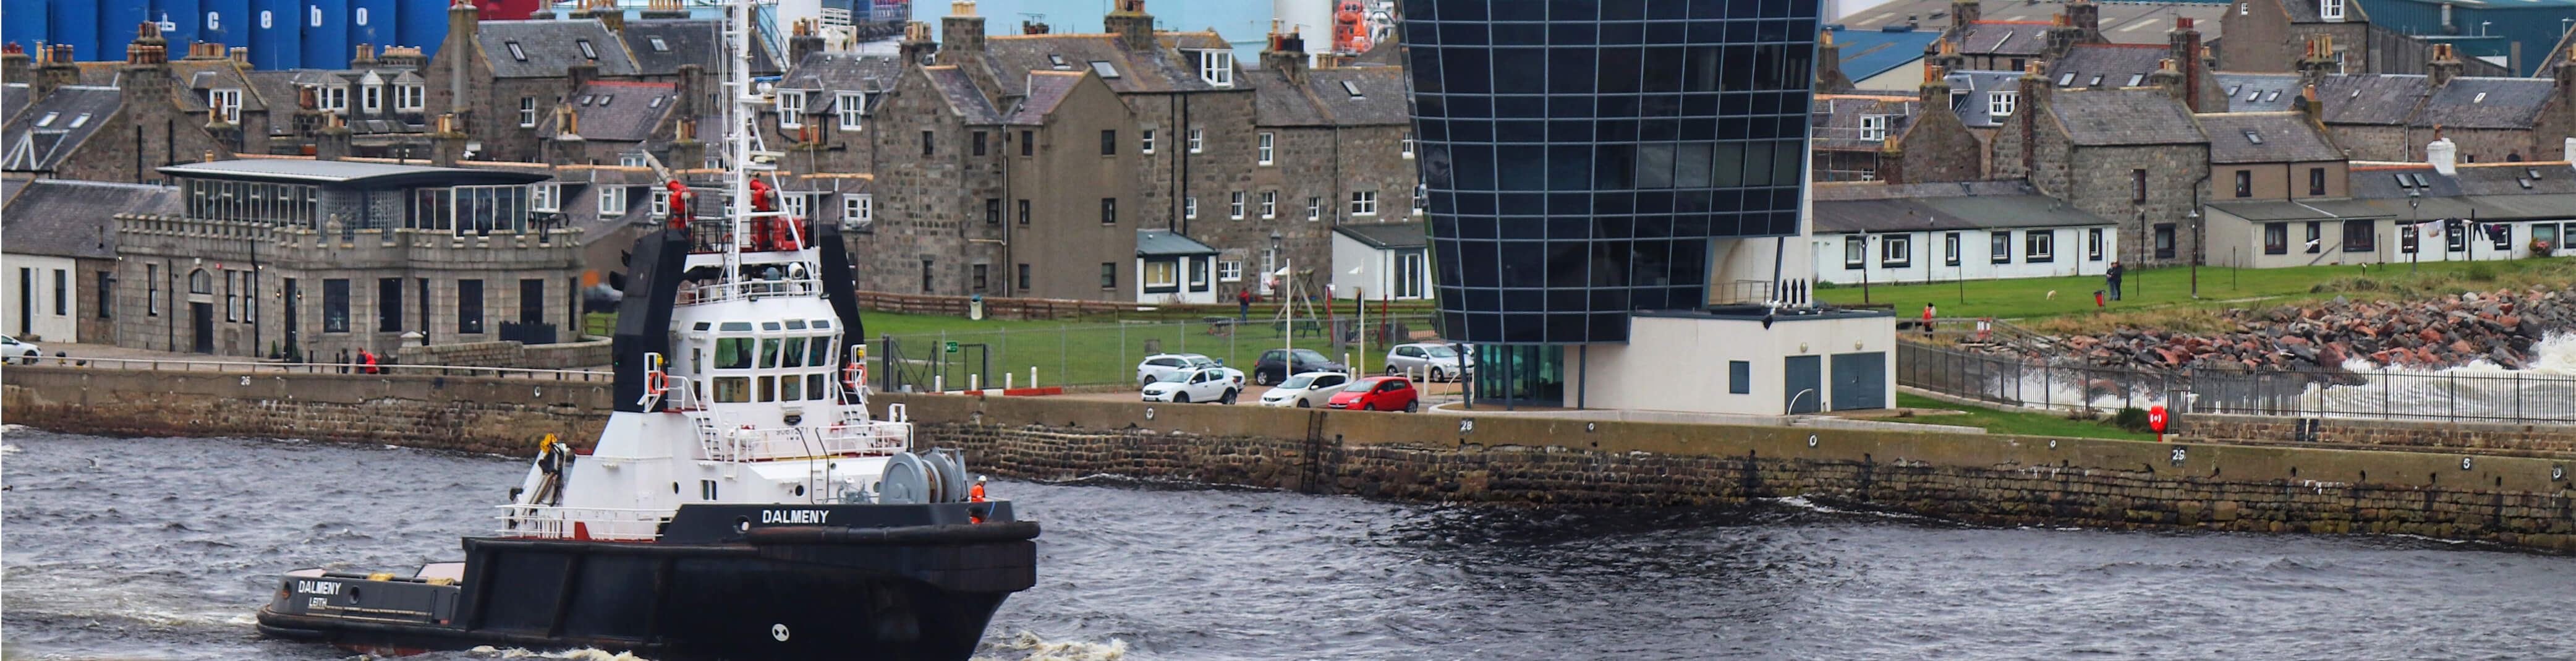 Online Training Courses In Aberdeen